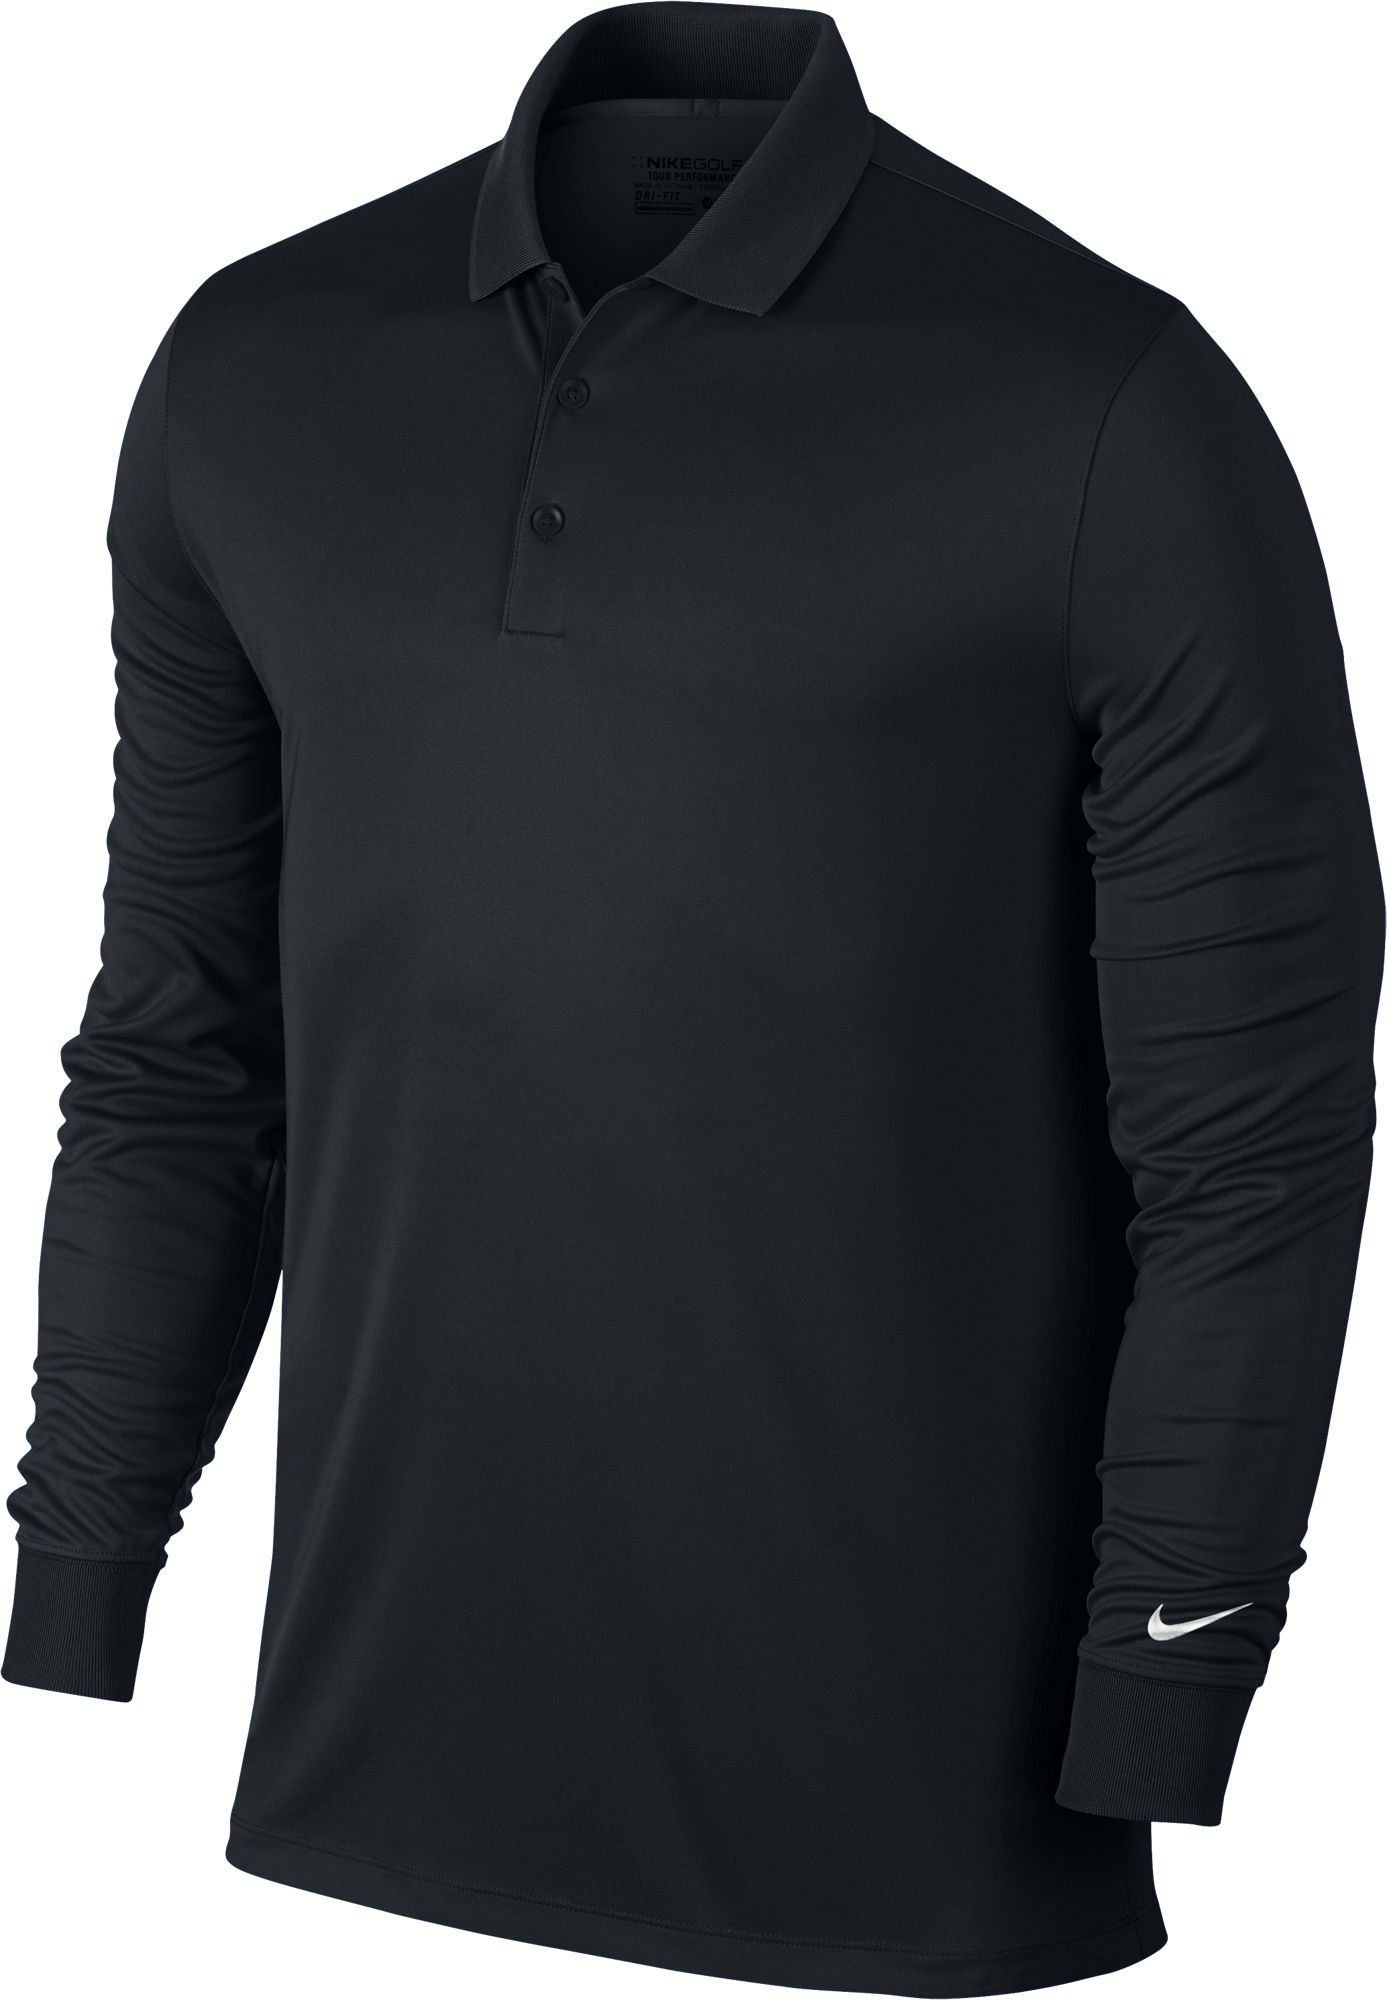 Nike Mens Dry Victory Polo Long Sleeve